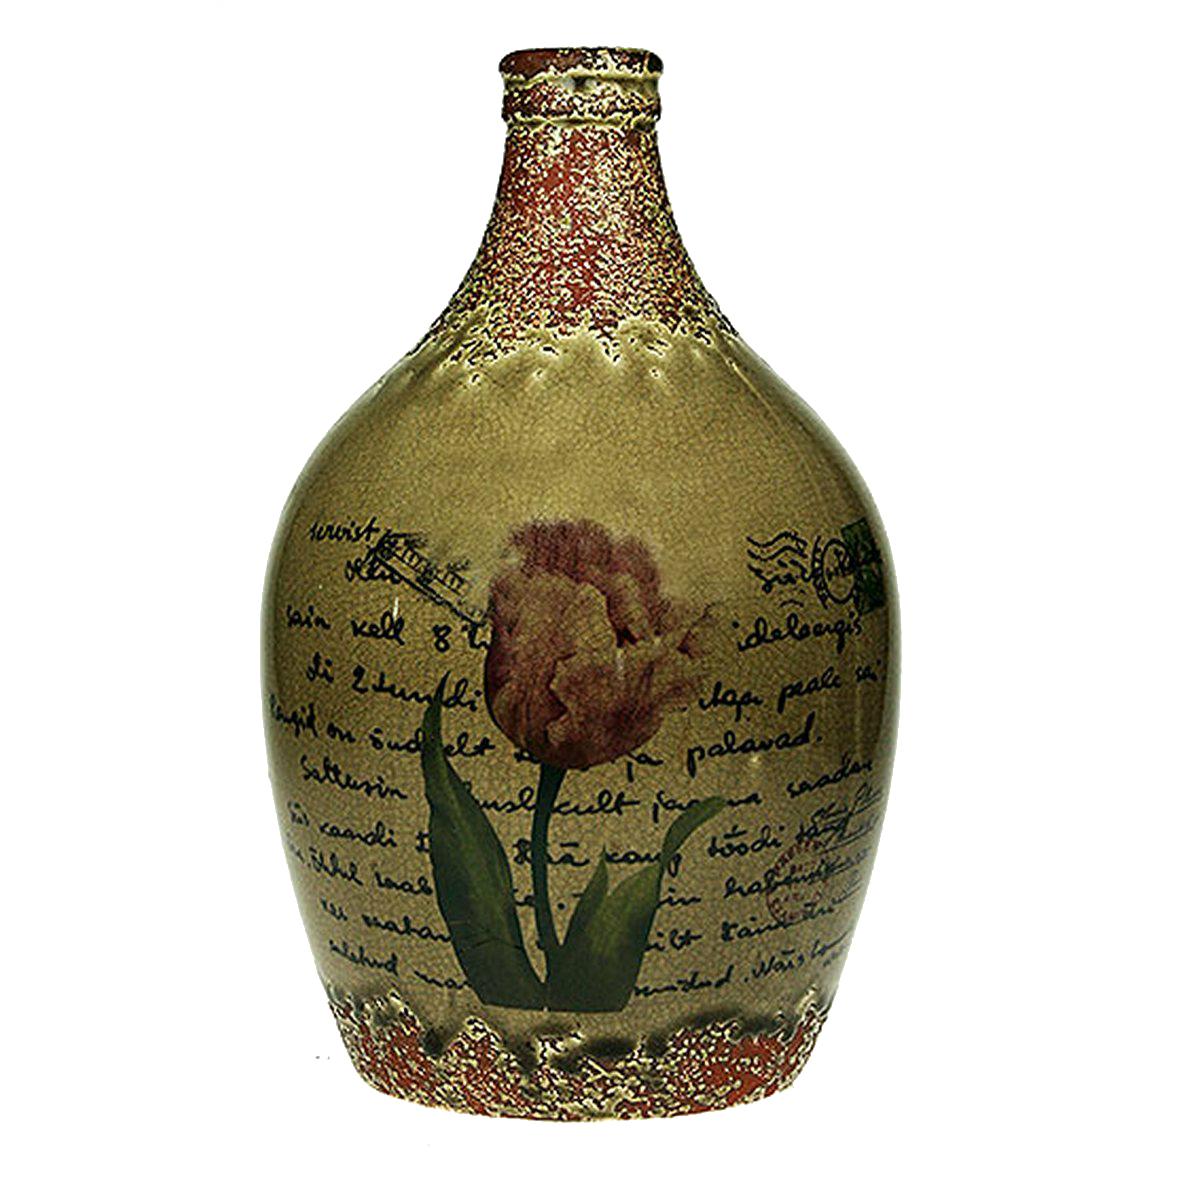 Ваза Русские Подарки Винтаж, высота 31 см. 123710 ваза arwa 20 х 20 х 30 см